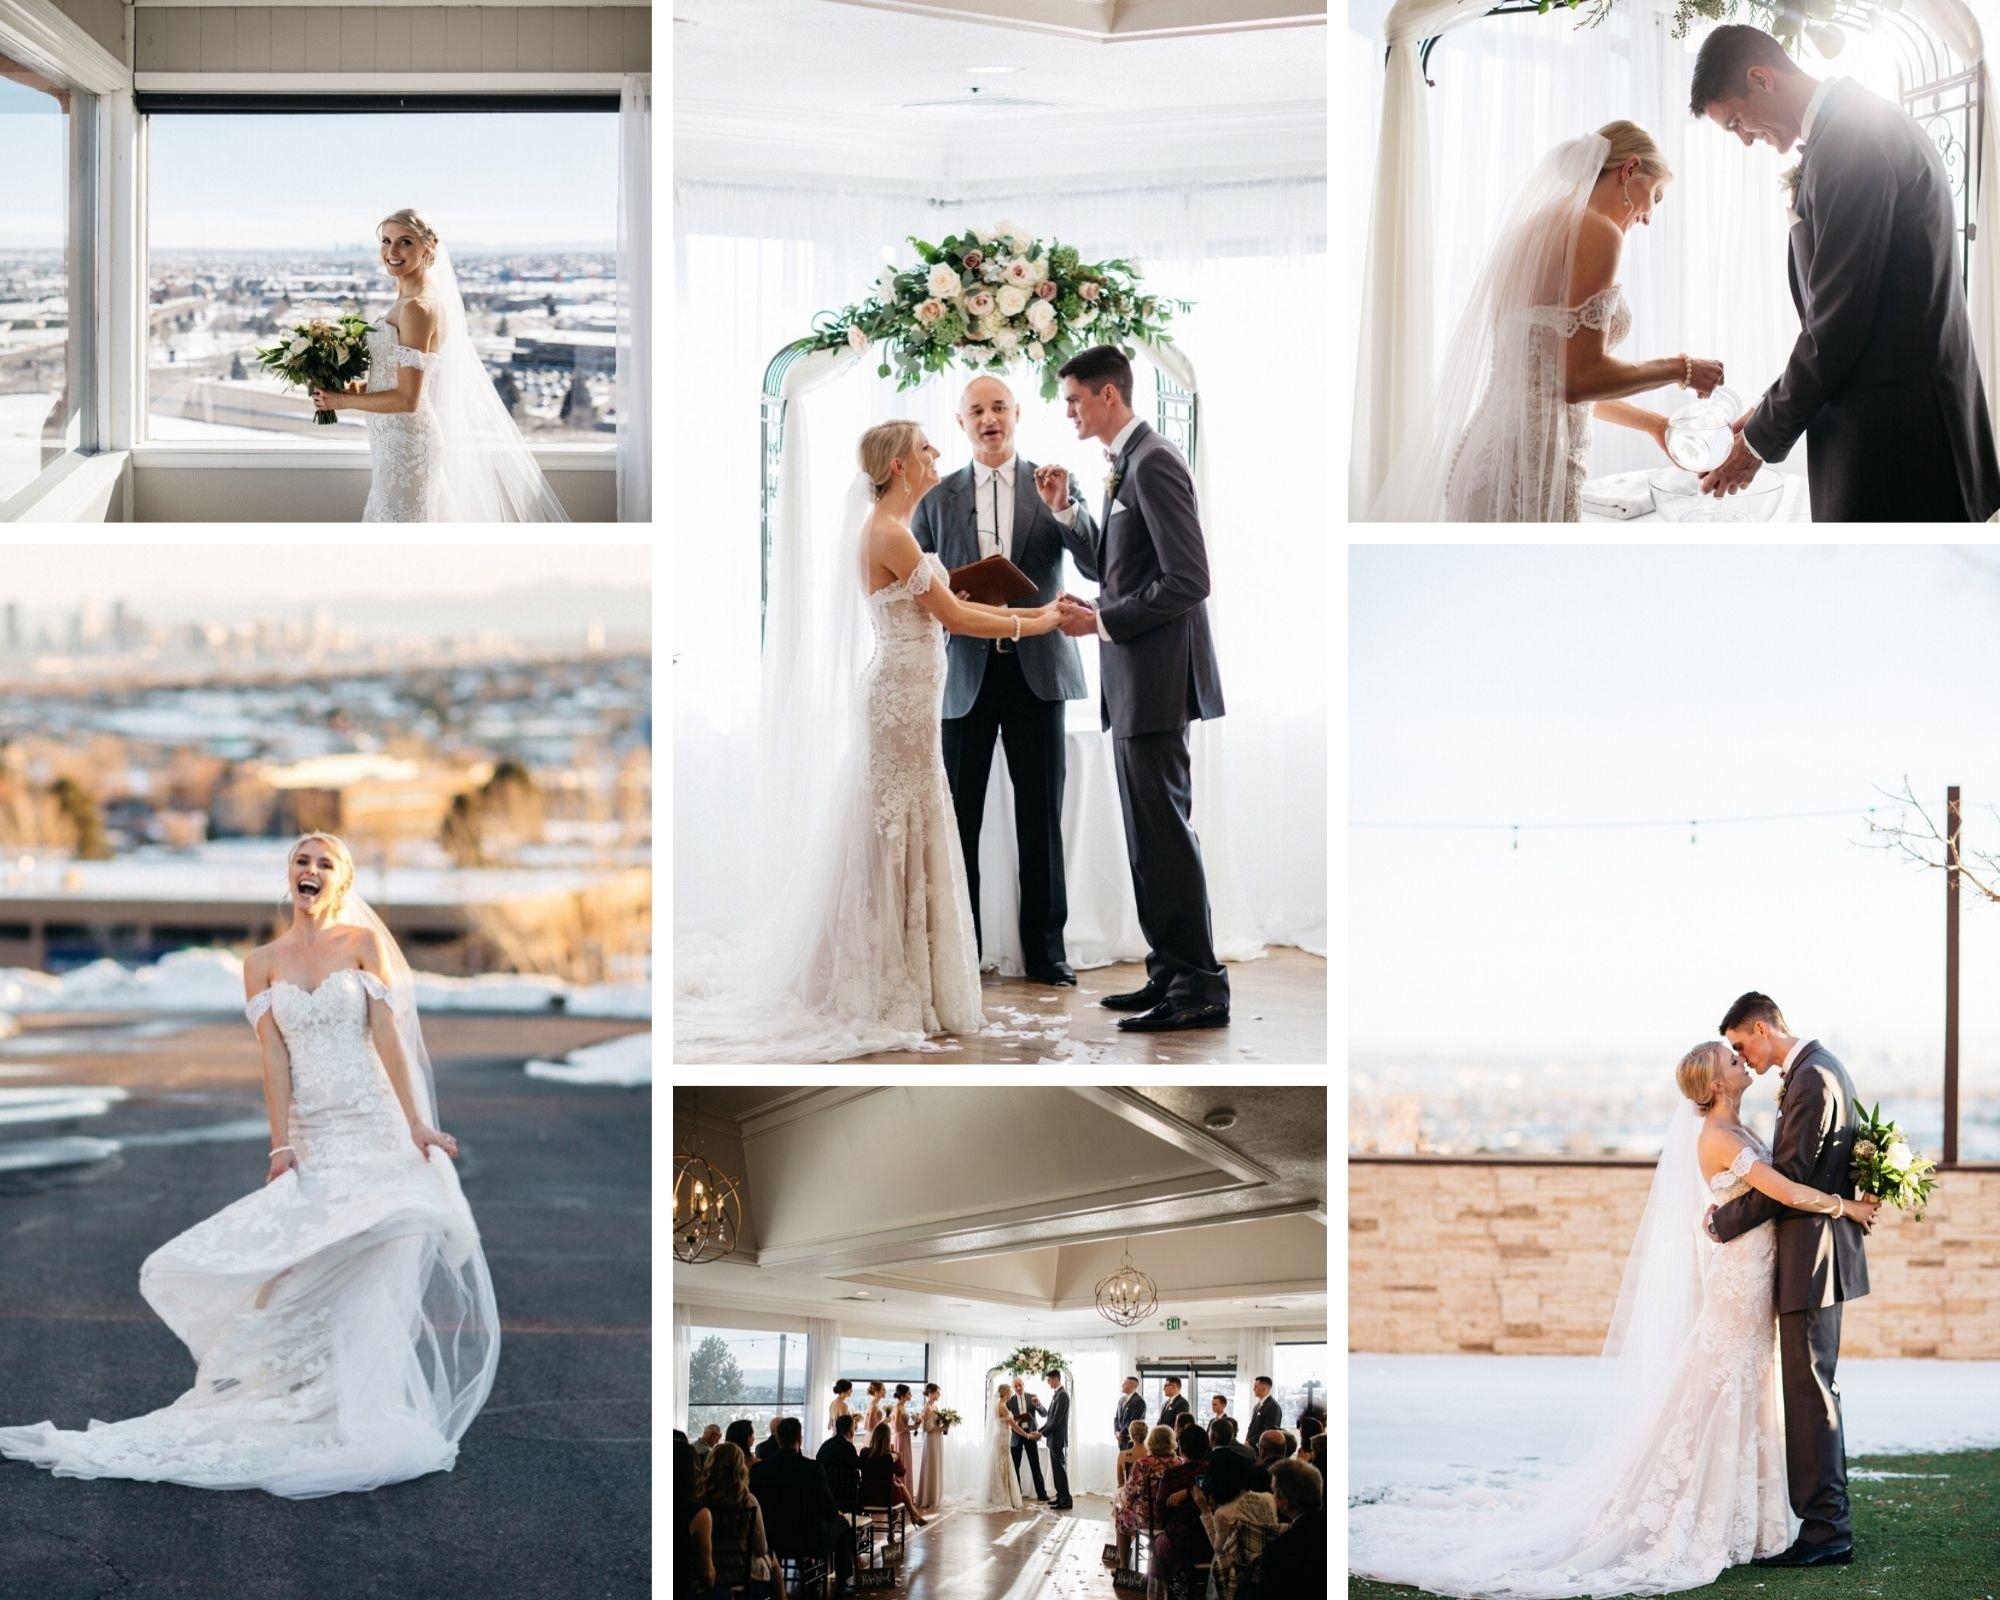 Pristine Snowy City Wedding at Brittany Hill